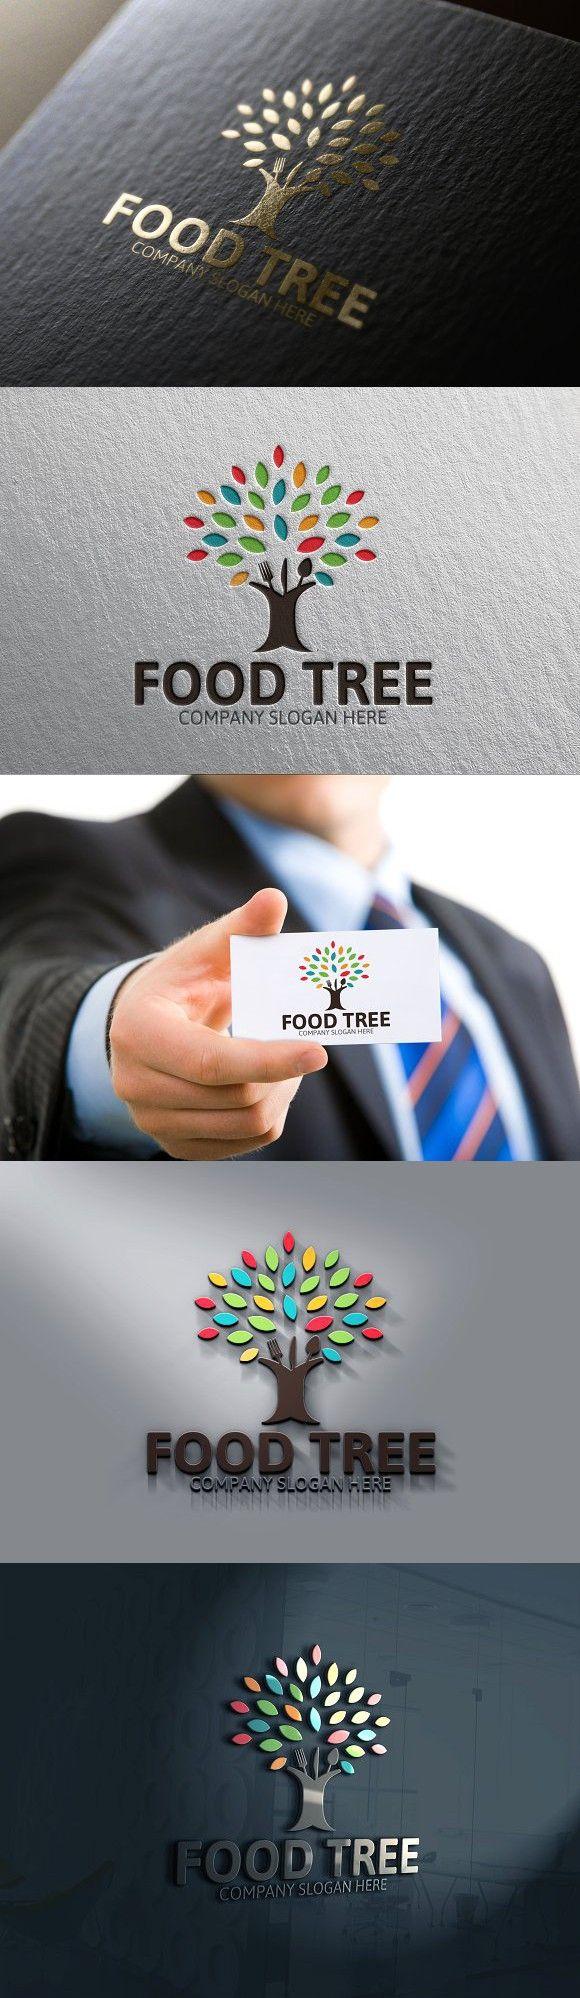 Food Tree Logo Tree logos, Logos, Tree